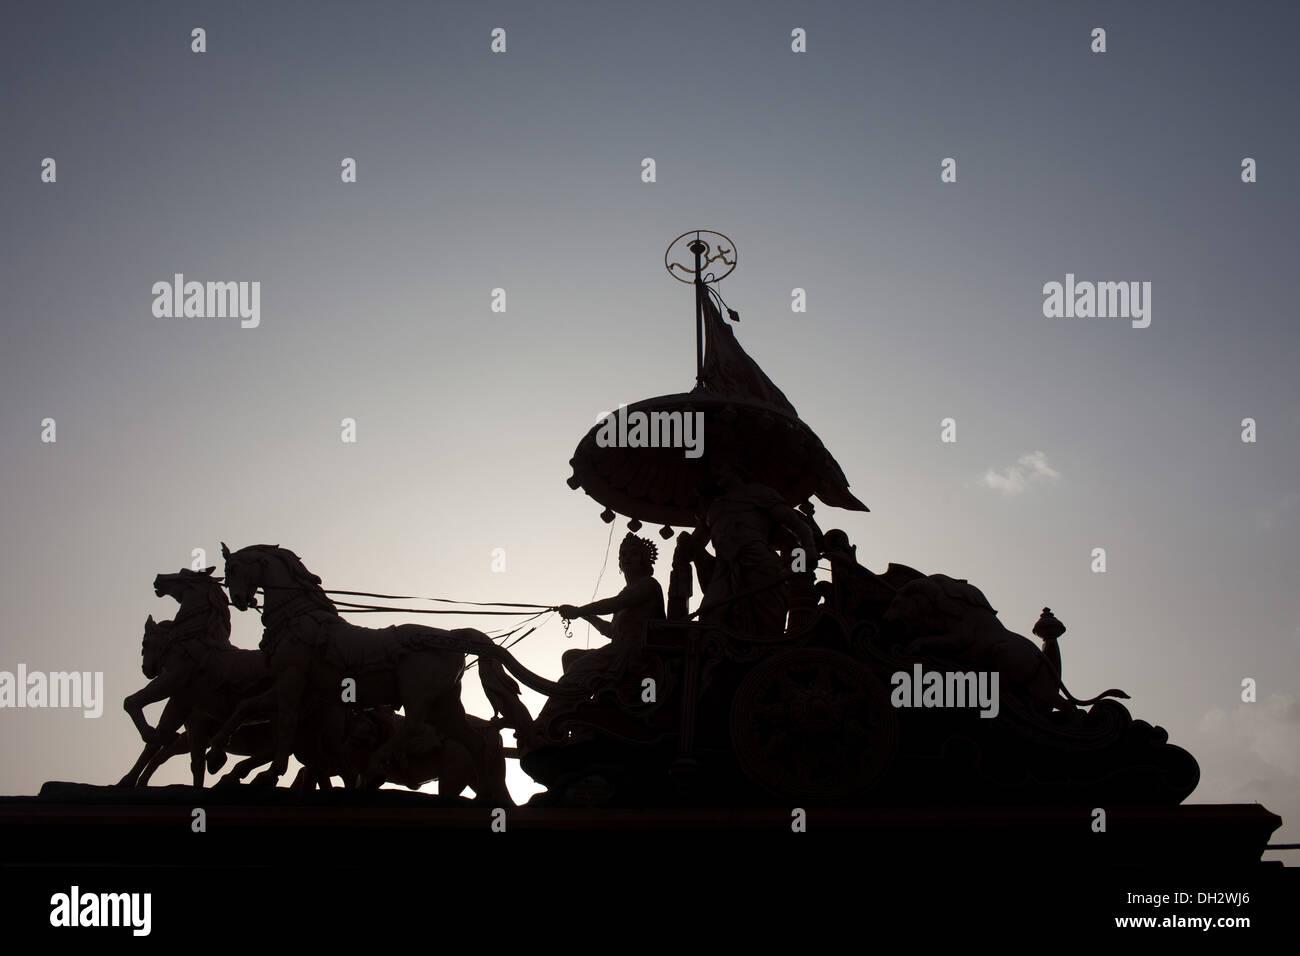 mahabharat arjuna horse chariot sculpture Rishikesh temple Uttarakhand India Asia - Stock Image